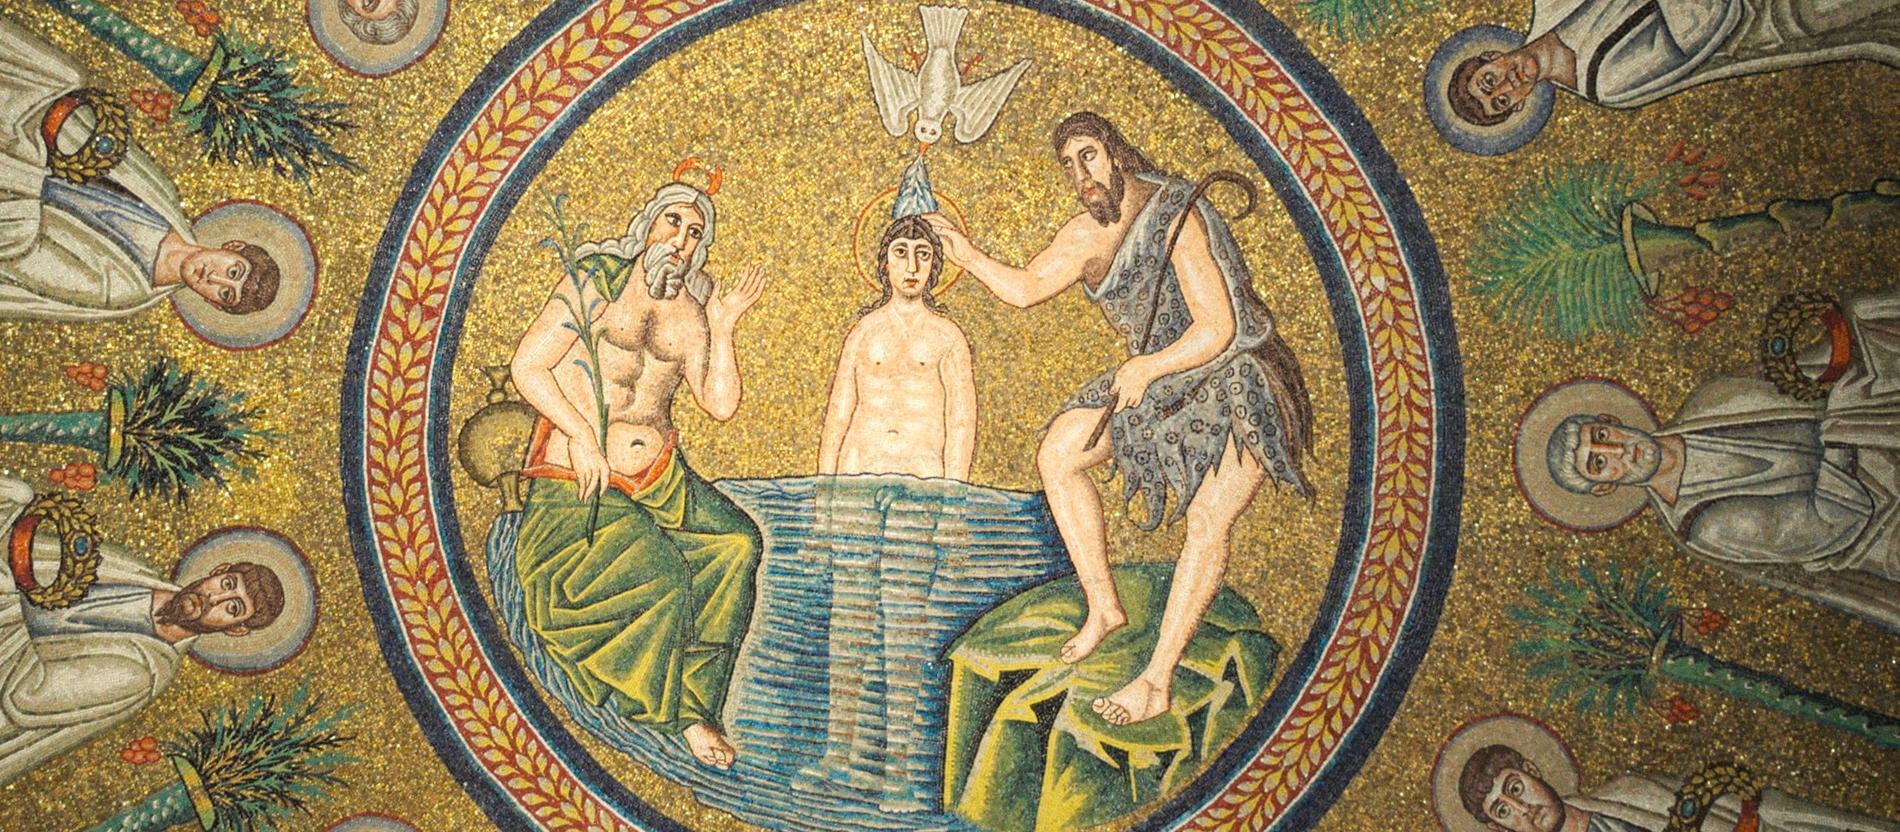 Taufe Jesu